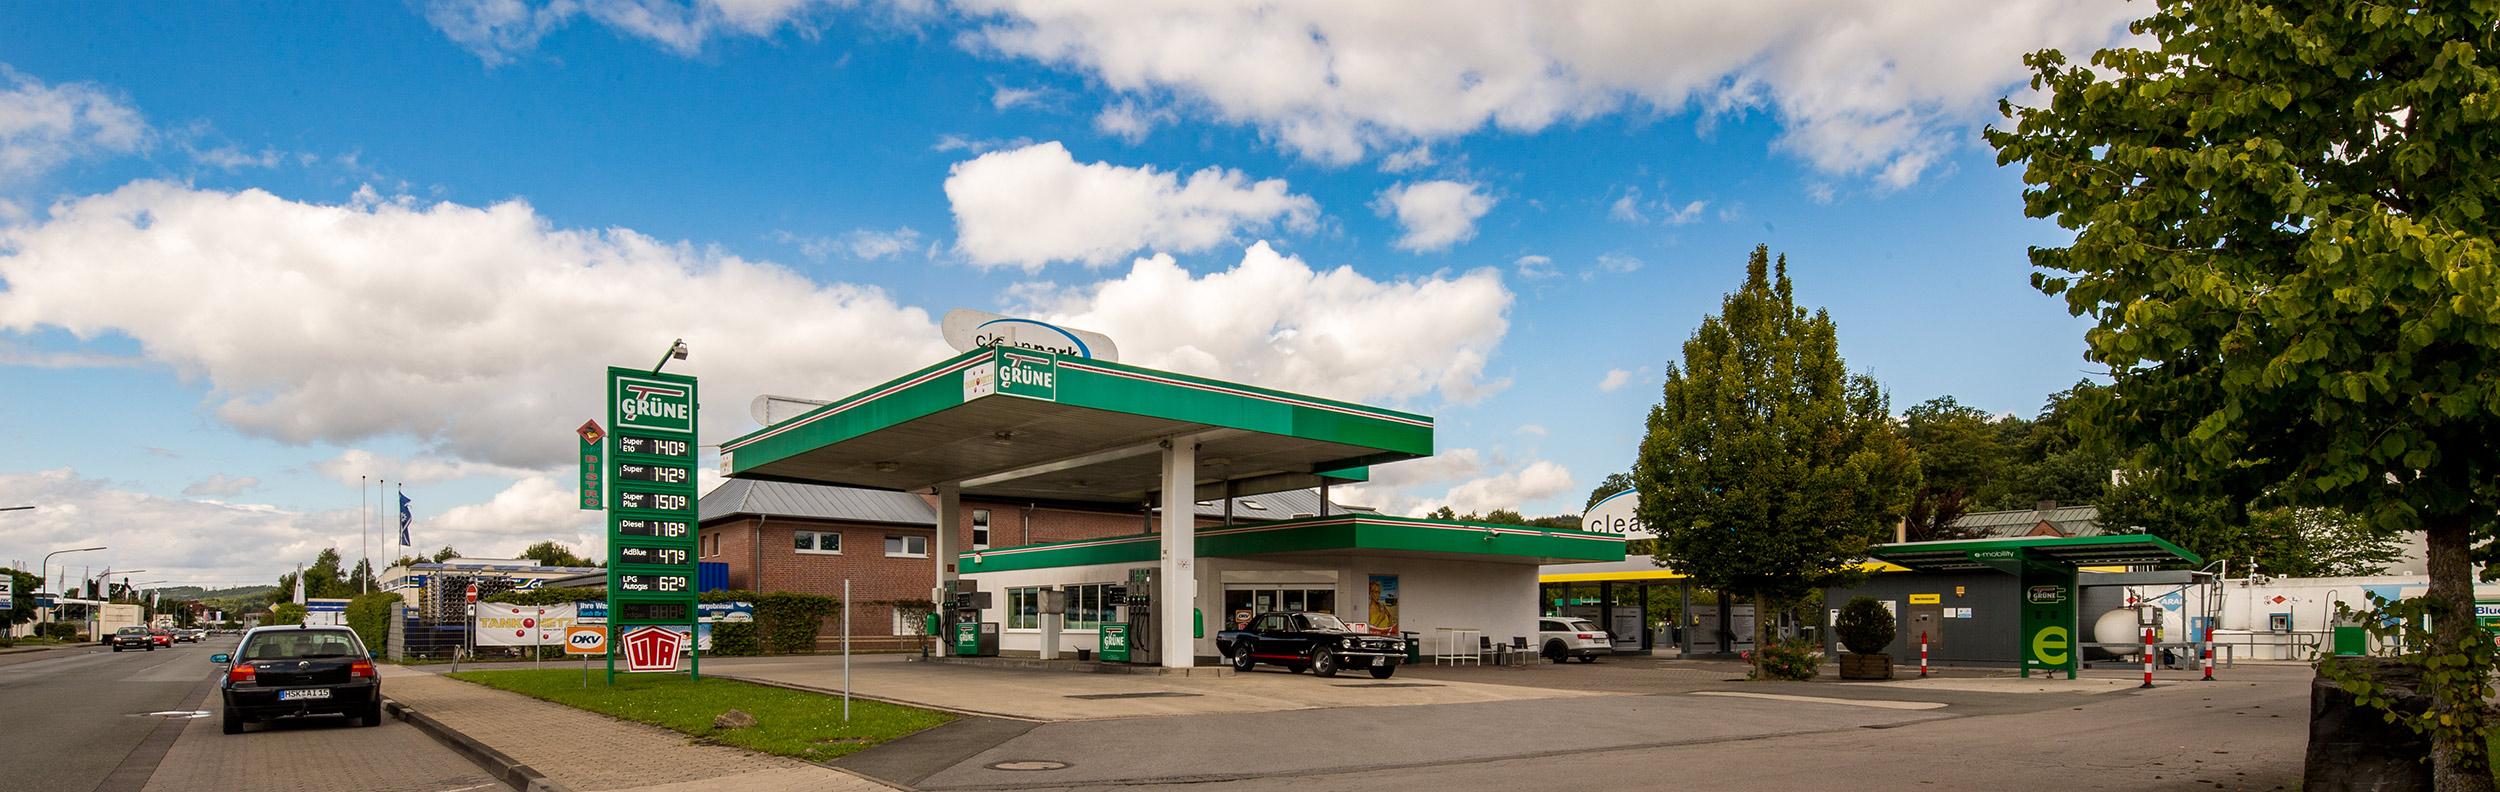 gruene-tankstellen-sauerland-004